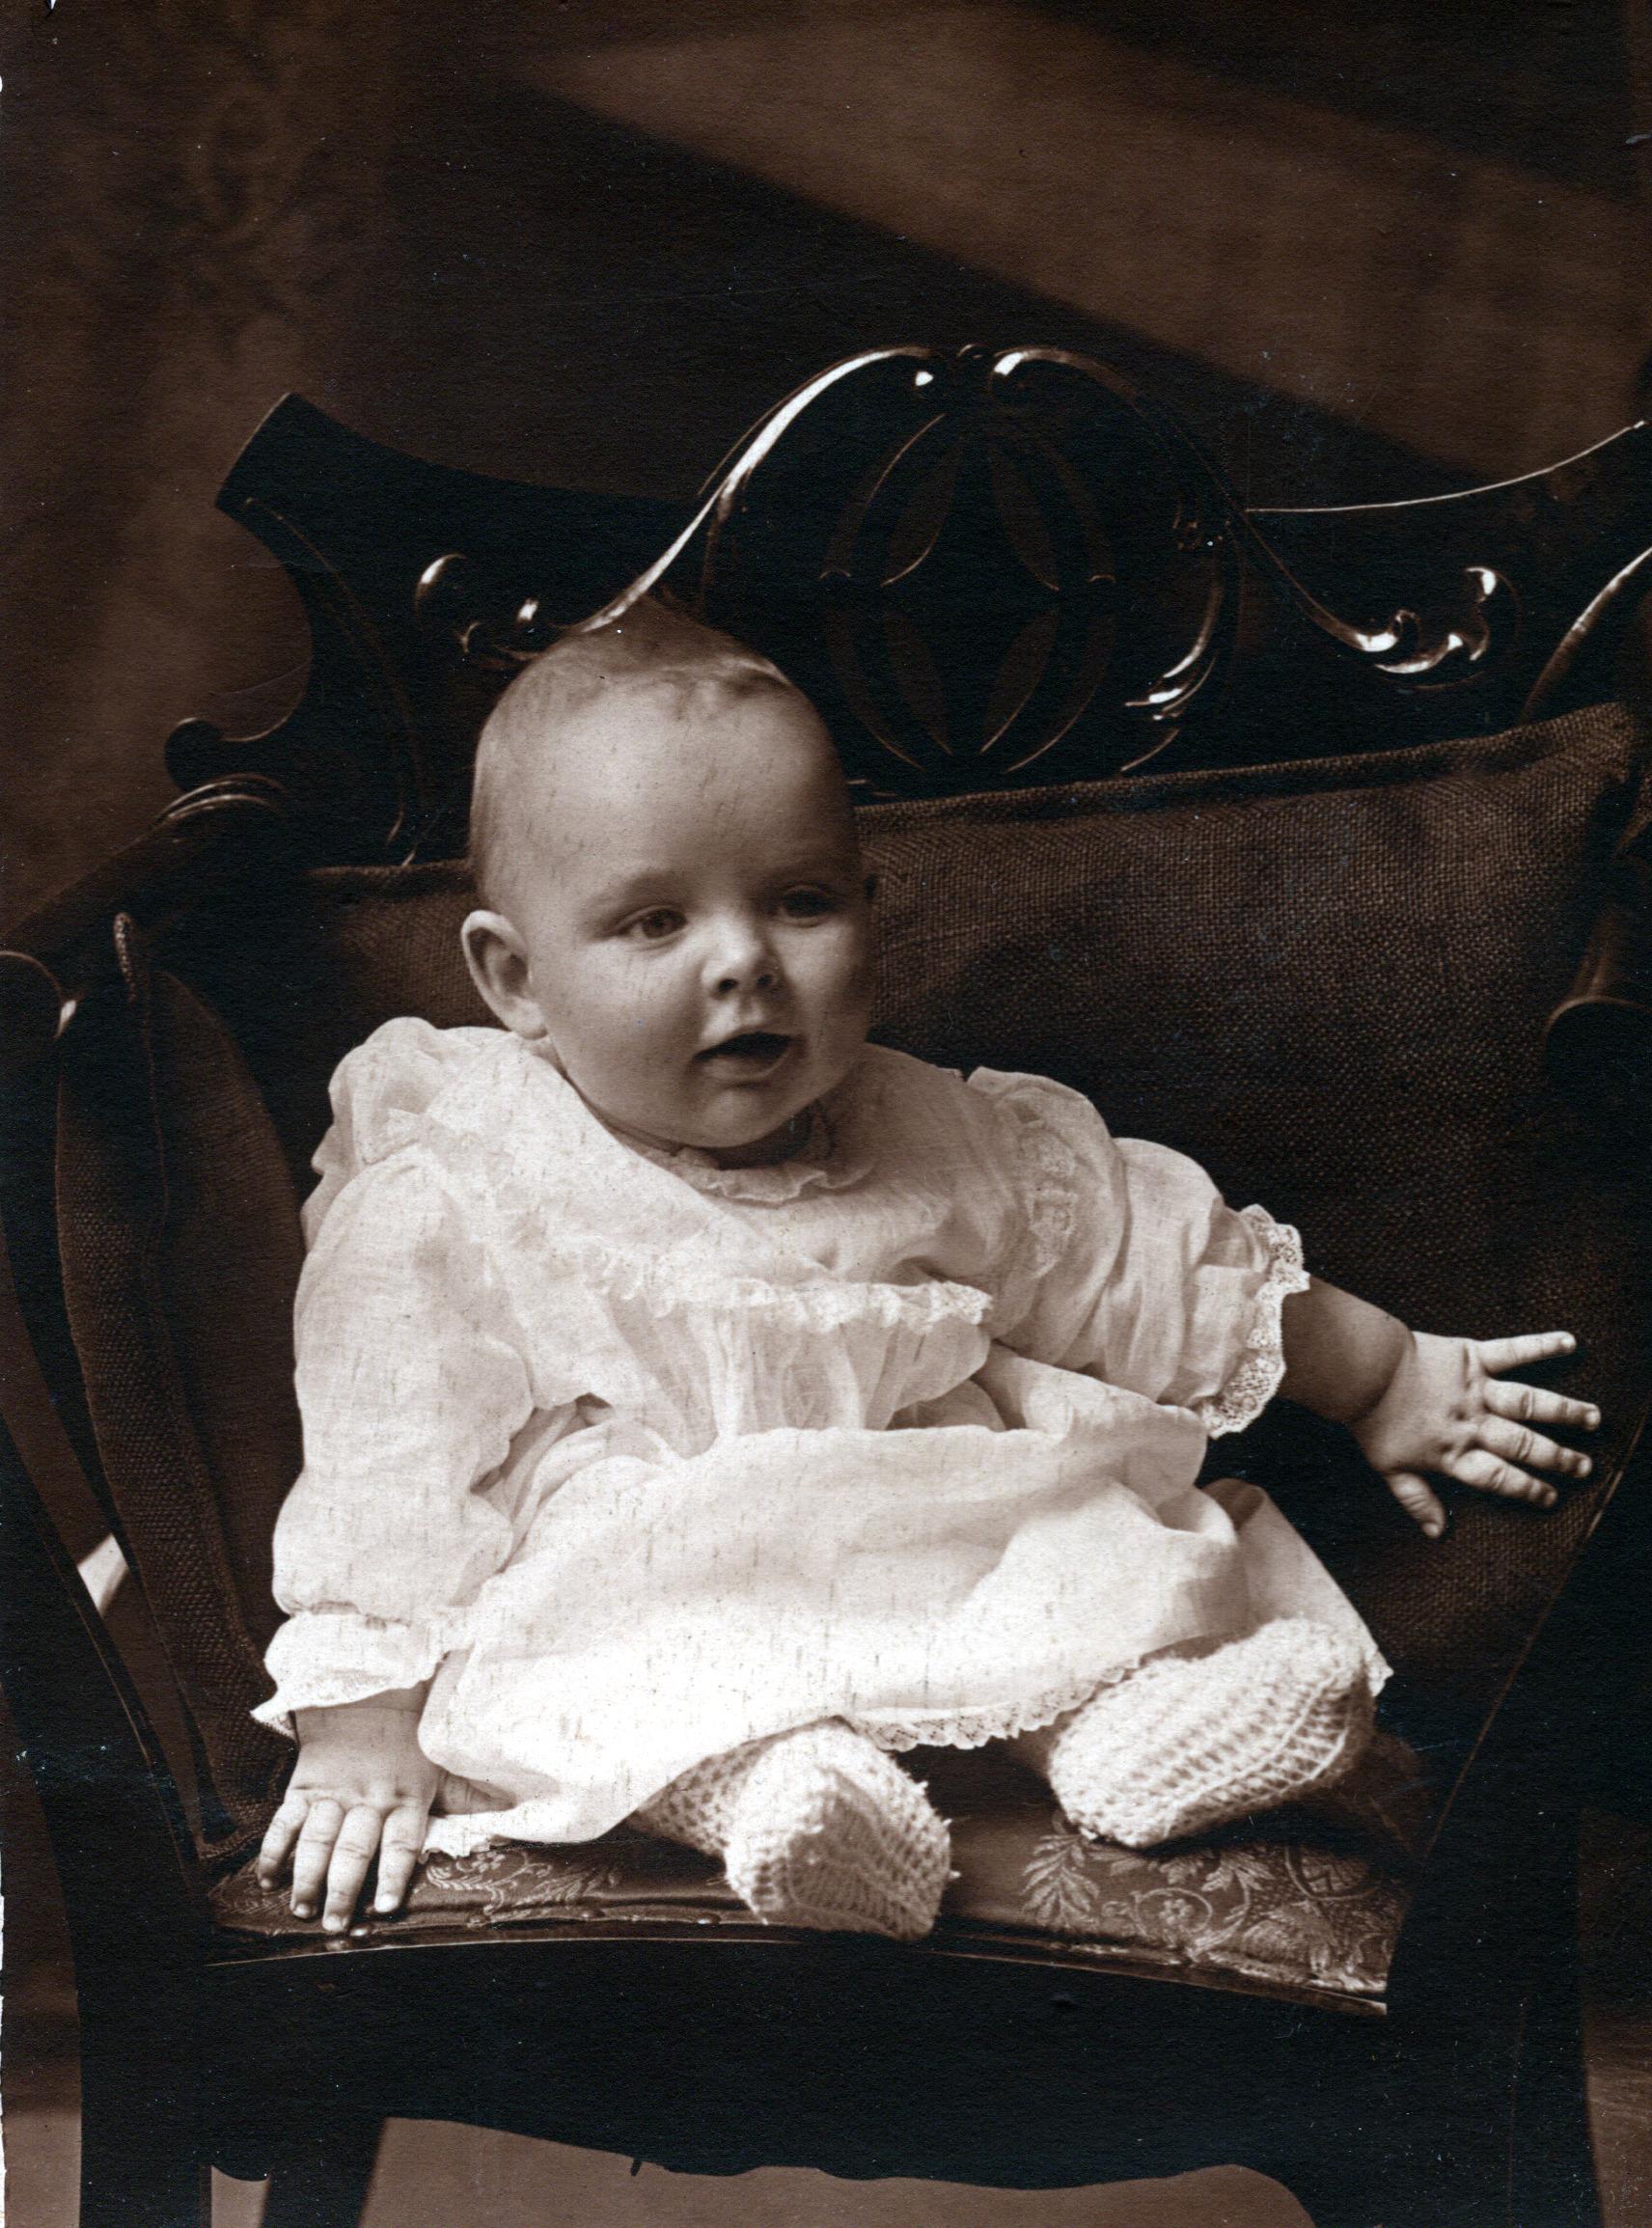 Shirley Phillips - 1921